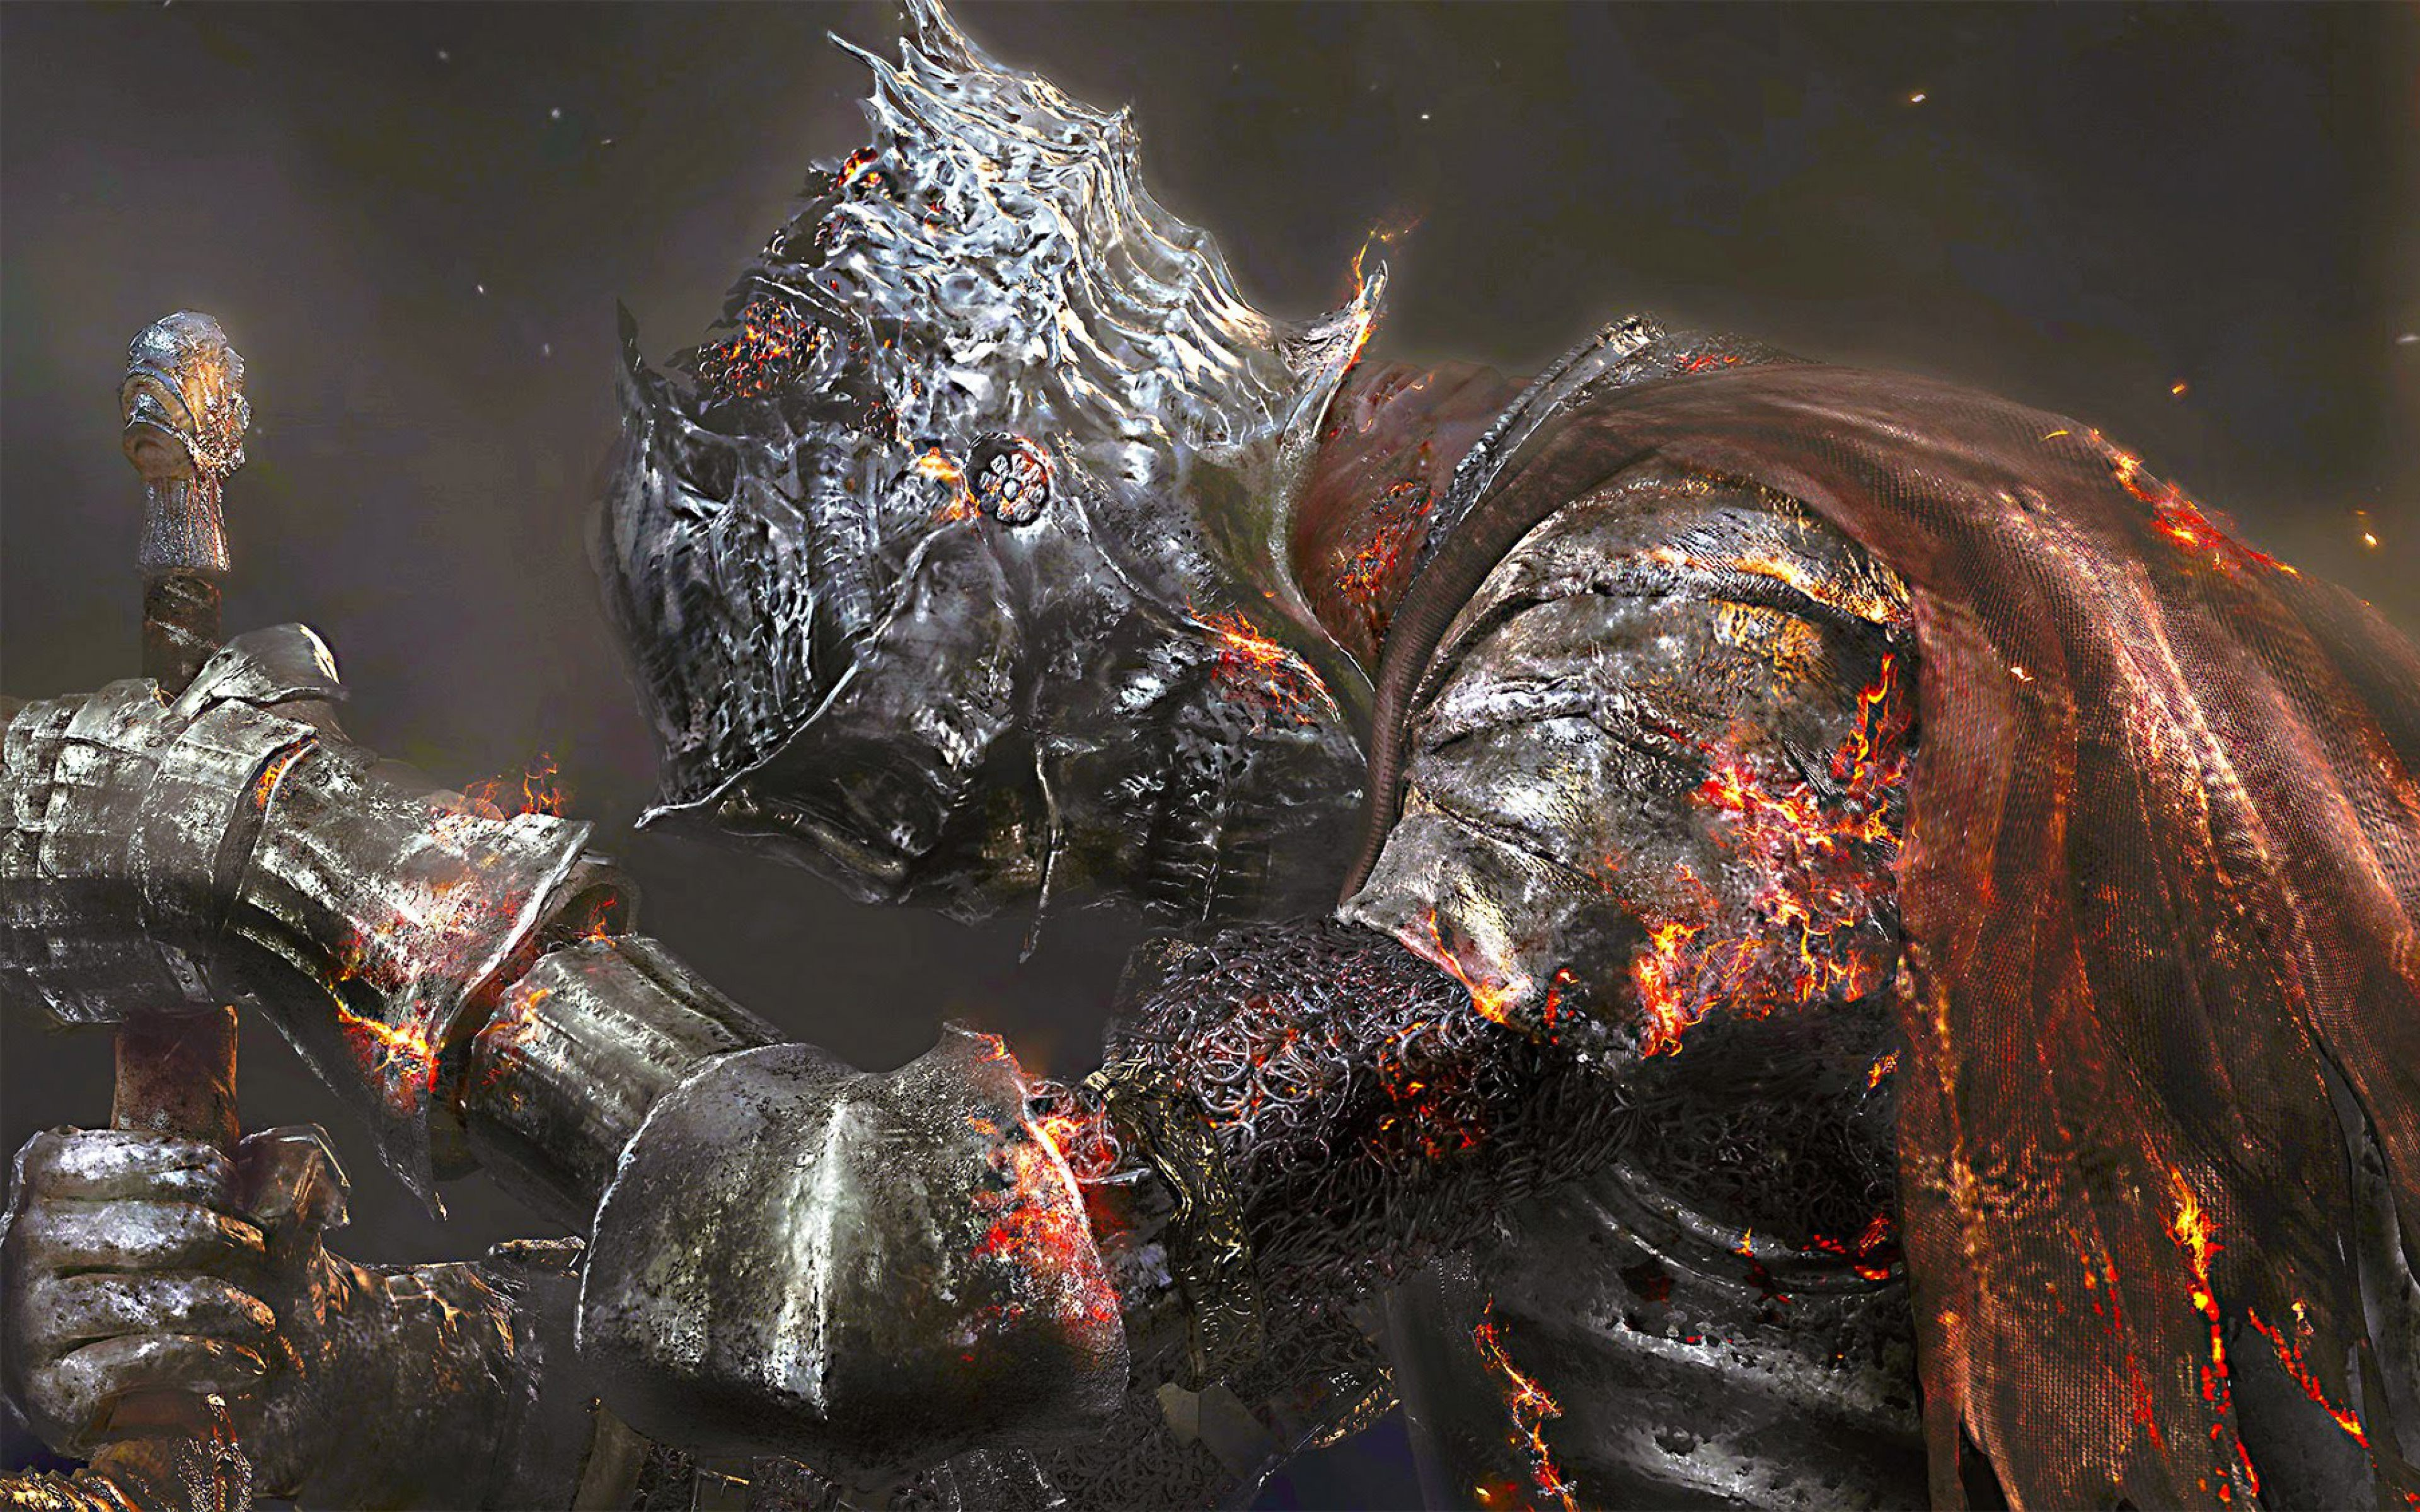 Dark Souls 3 Game Warrior 4K Wallpaper download in high quality 3840x2400